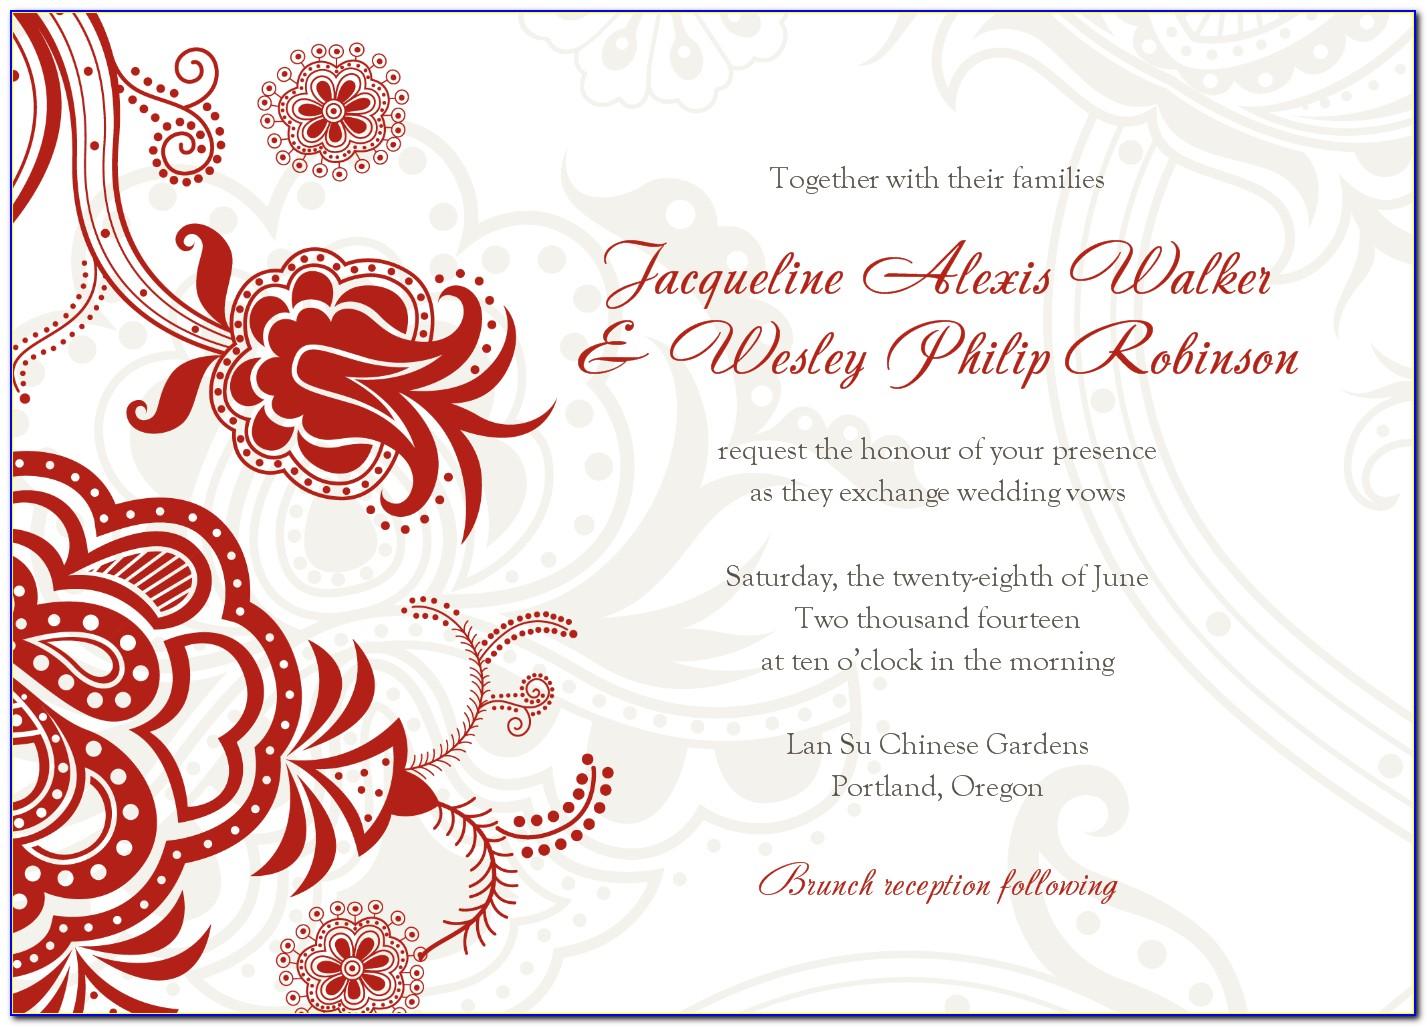 Invitation Card Design Template Psd